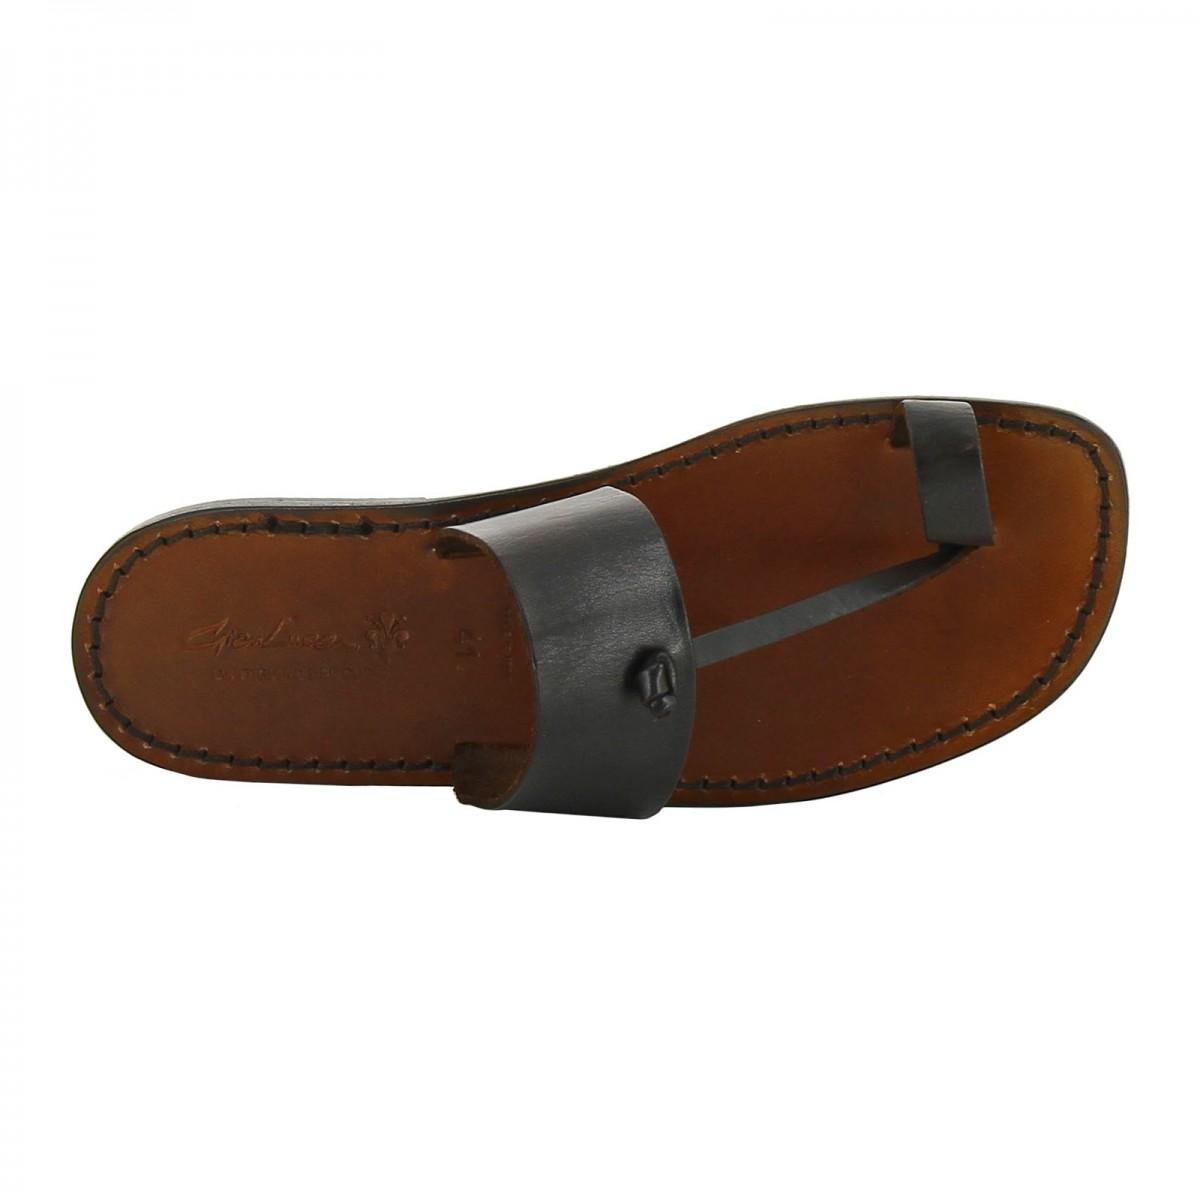 sandals tong cuir homme marron fonc artisanales gianluca l 39 artisan du cuir. Black Bedroom Furniture Sets. Home Design Ideas